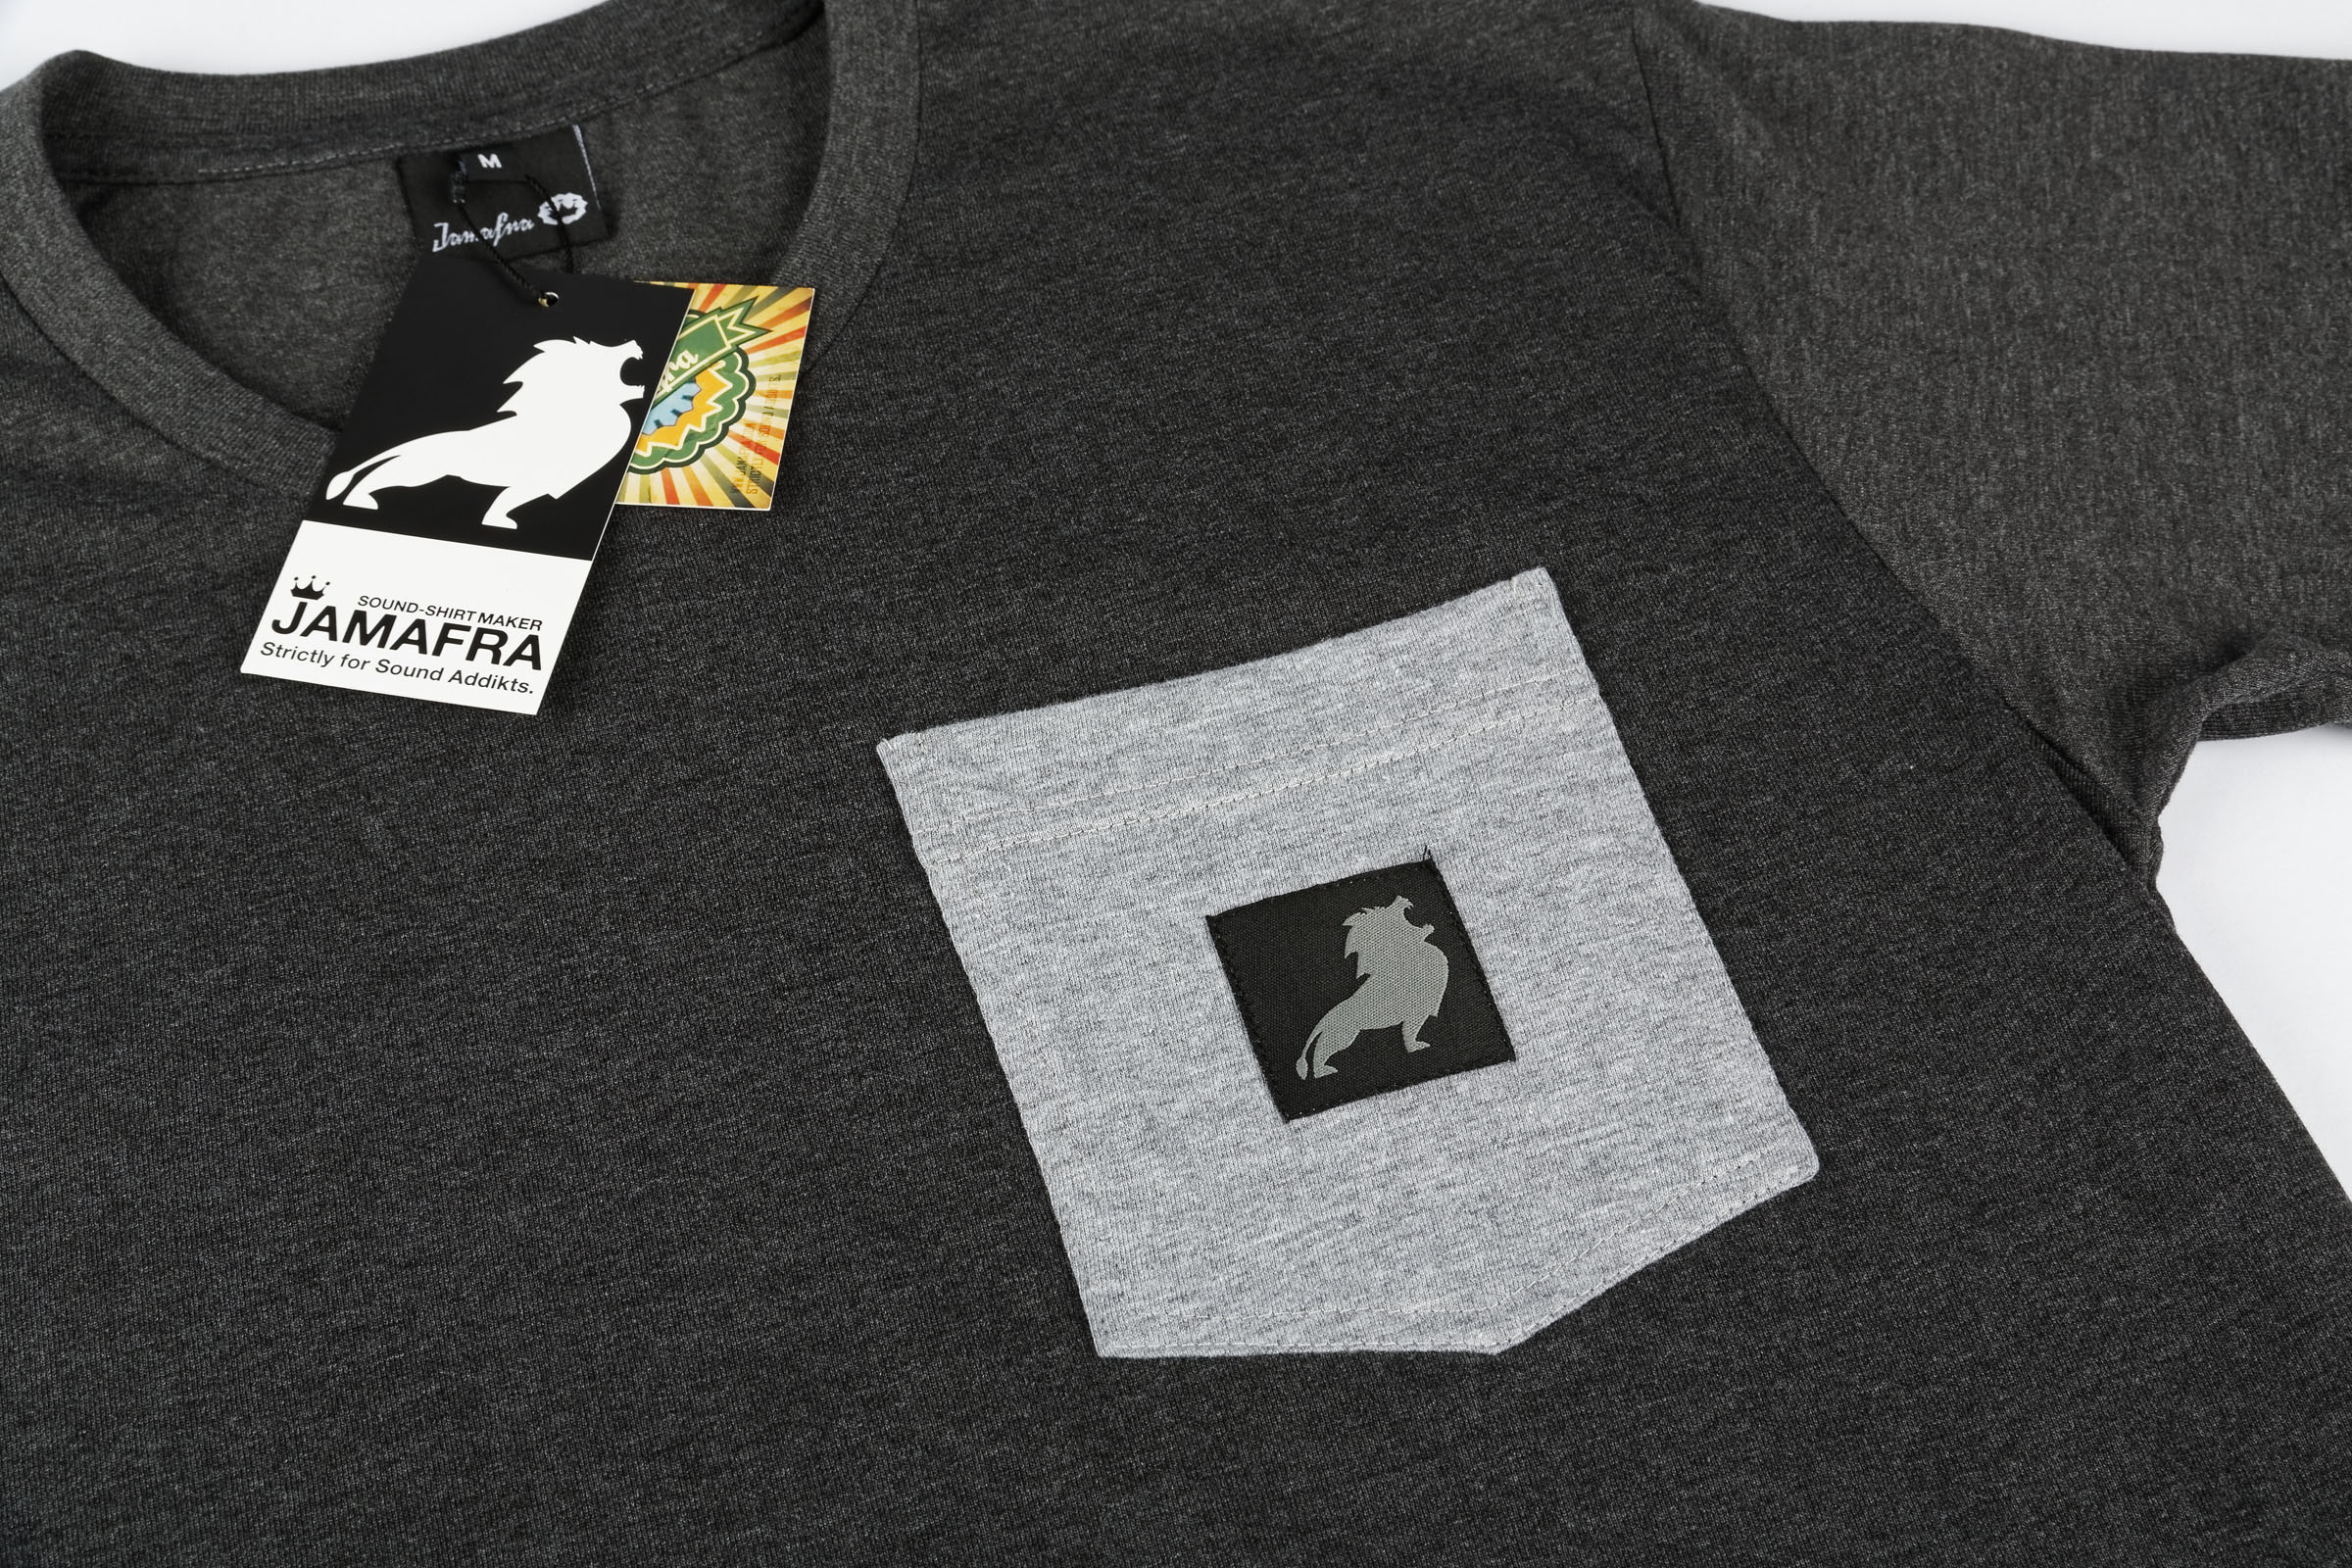 Nouveau tee-shirt Jamafra Lion Pocket